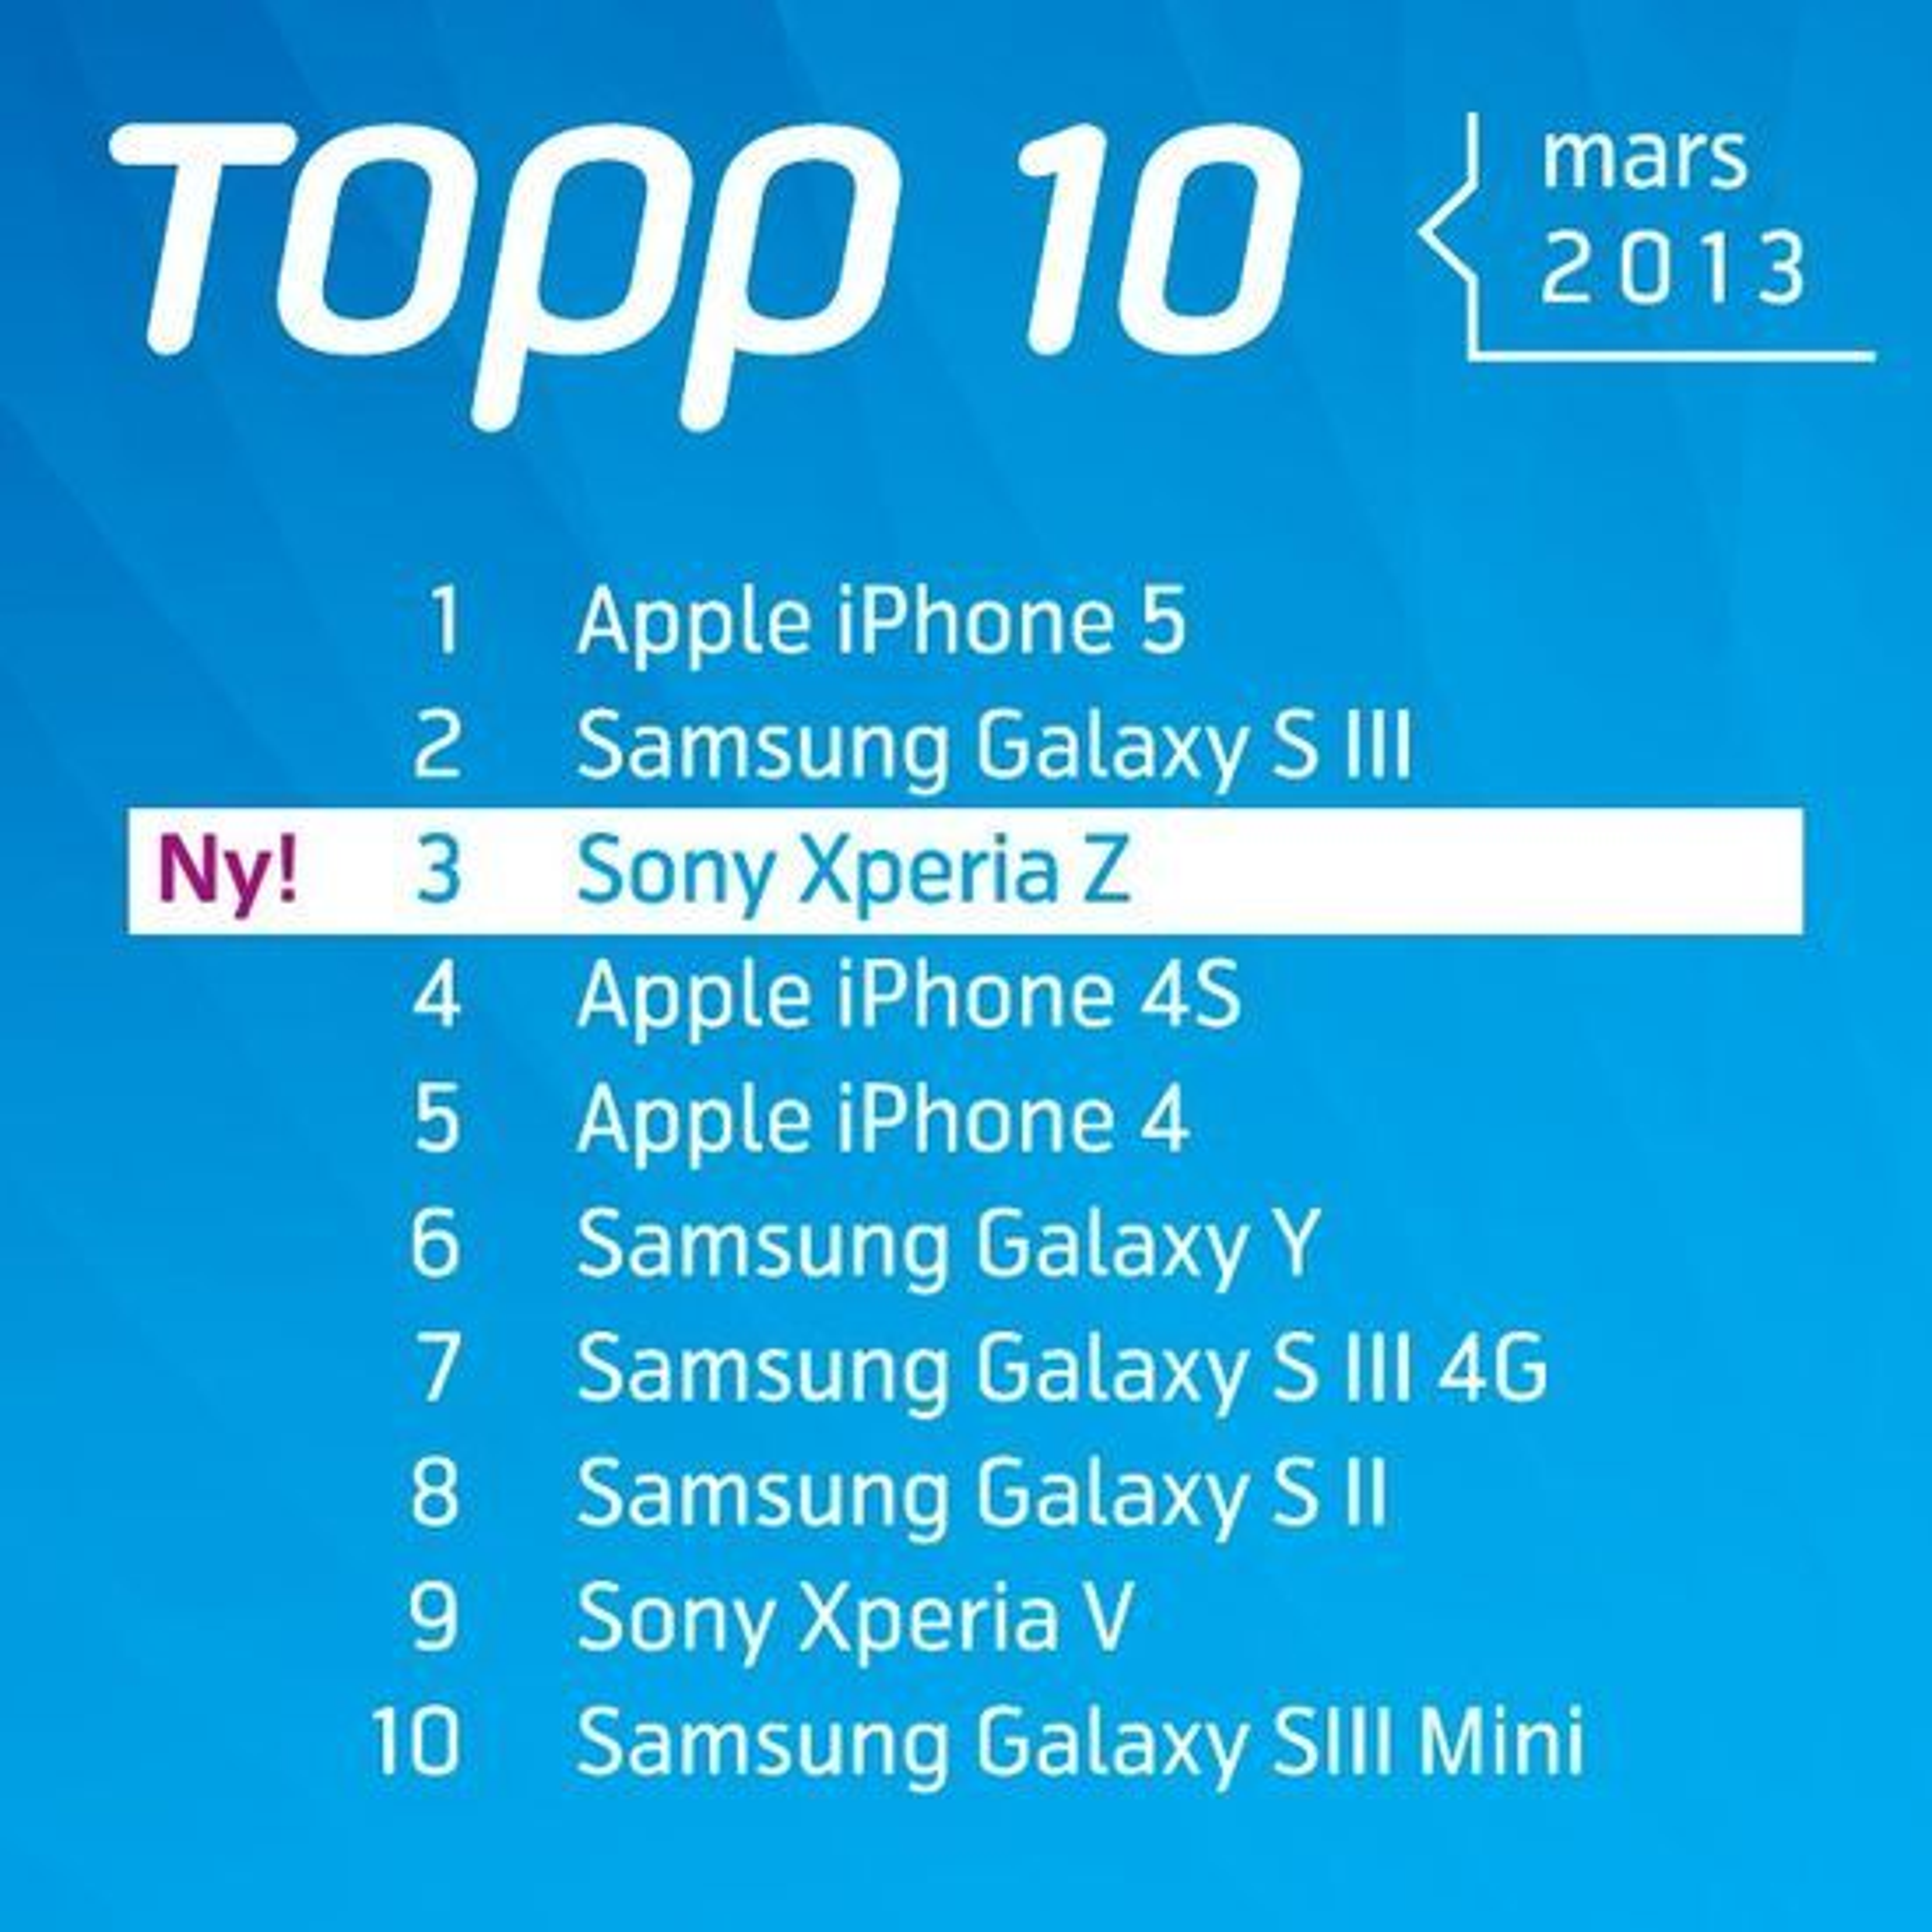 De ti mest solgte smartmobilmodellene i Telenors salgskanal i mars 2013.